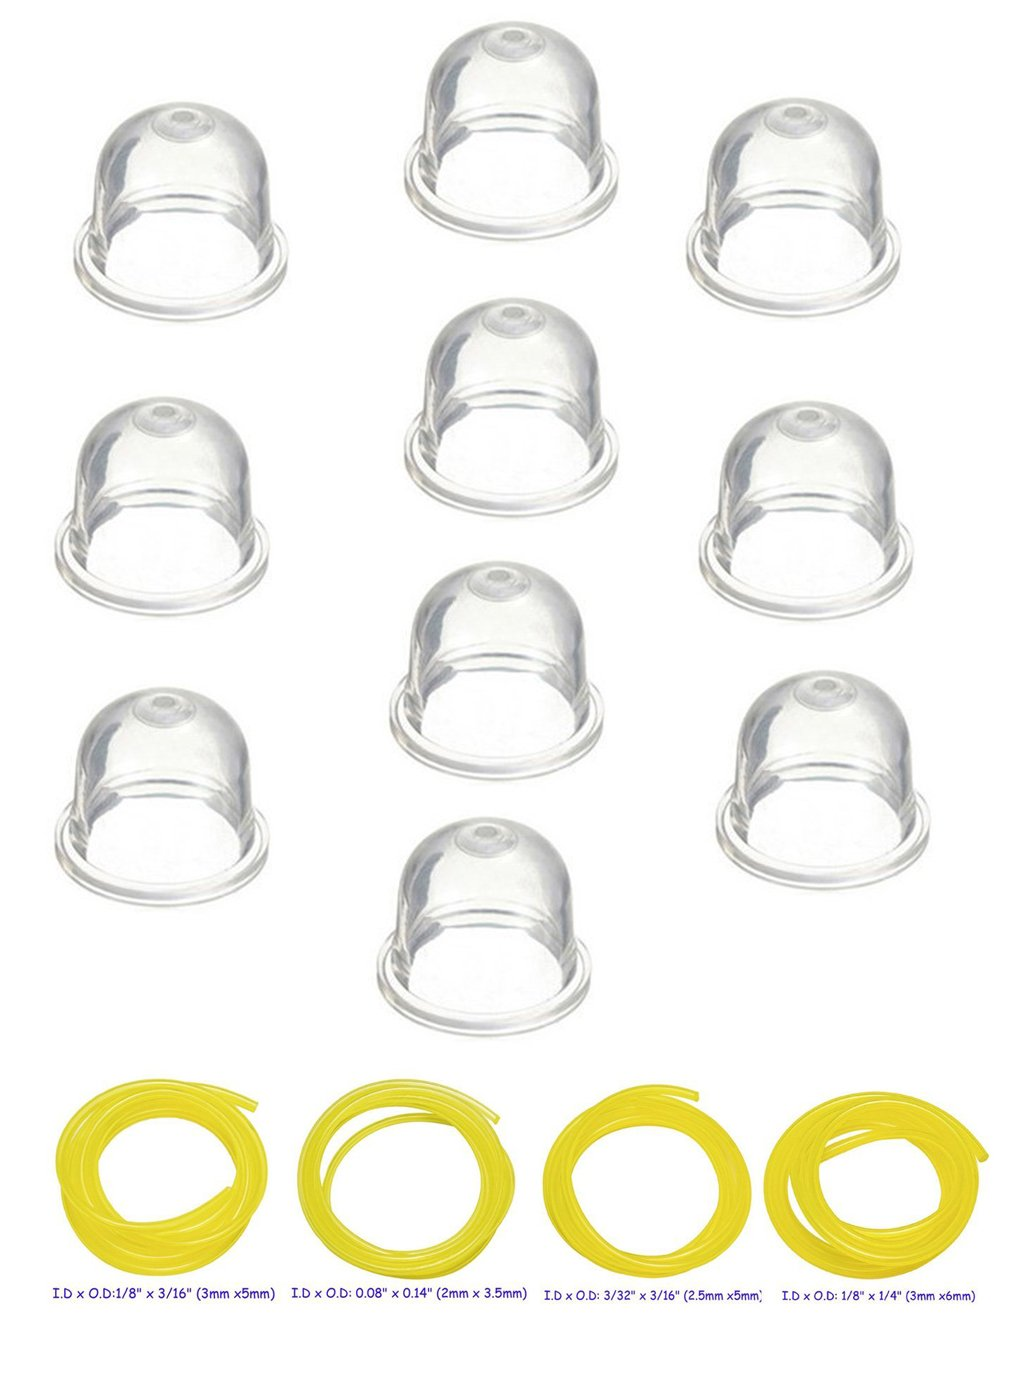 Replacement Transparent Primer Bulbs Parts For Shindaiwa 188-12-1 188-12 Set